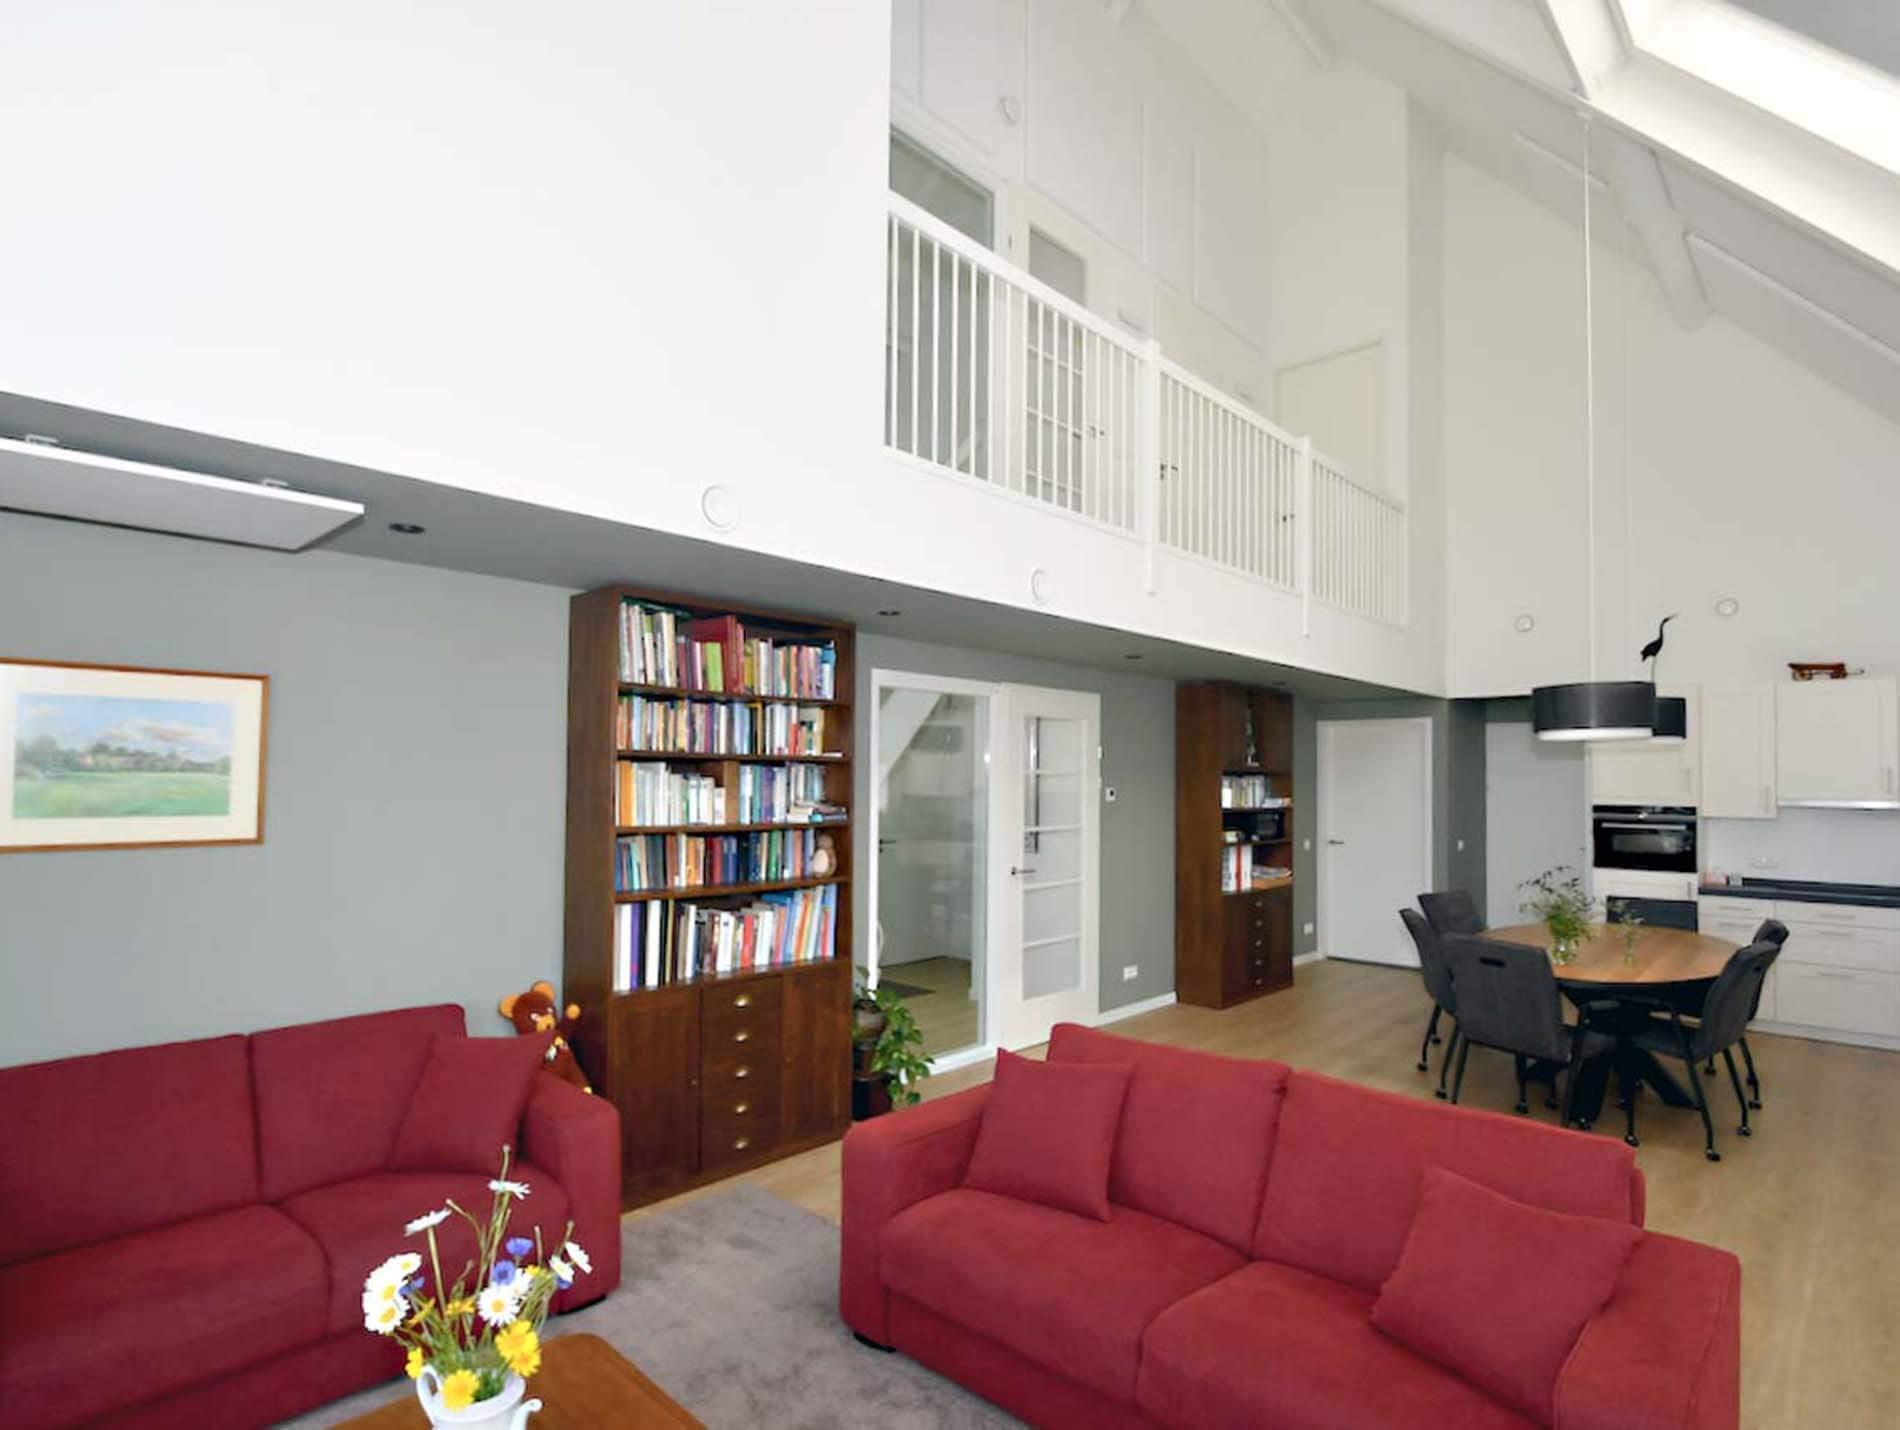 7. interieur-Wijnjewouden-particuliere-woning-i1900x1430p.jpg